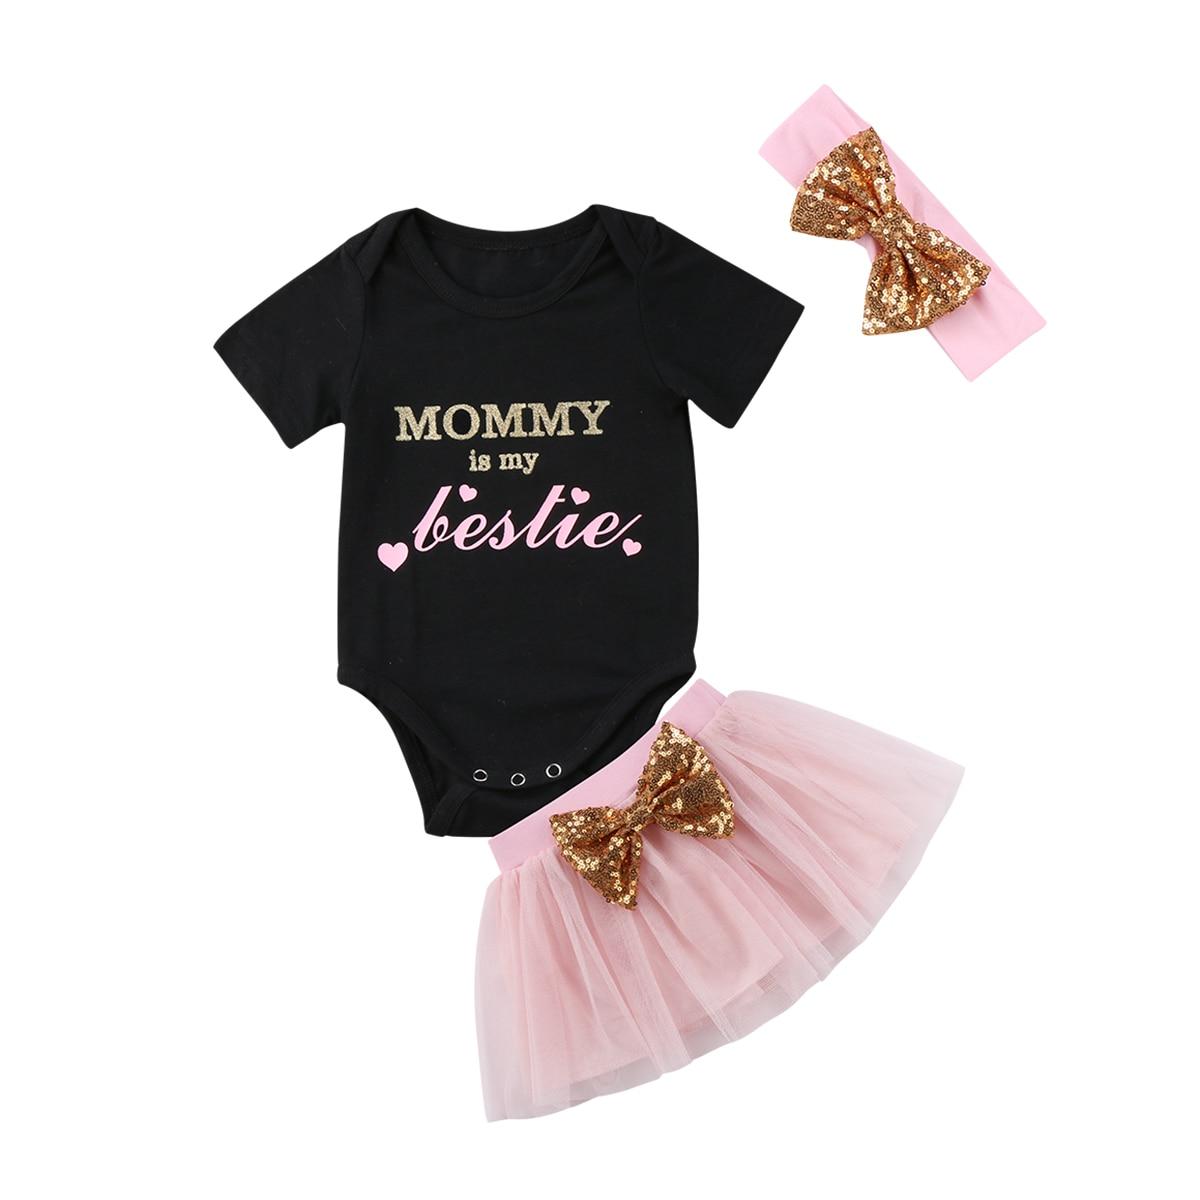 Godfer Arabe Unisex Tank Top Love Basketball MOM Baby Onesies Bodysuit Jumpsuit Waistcoat